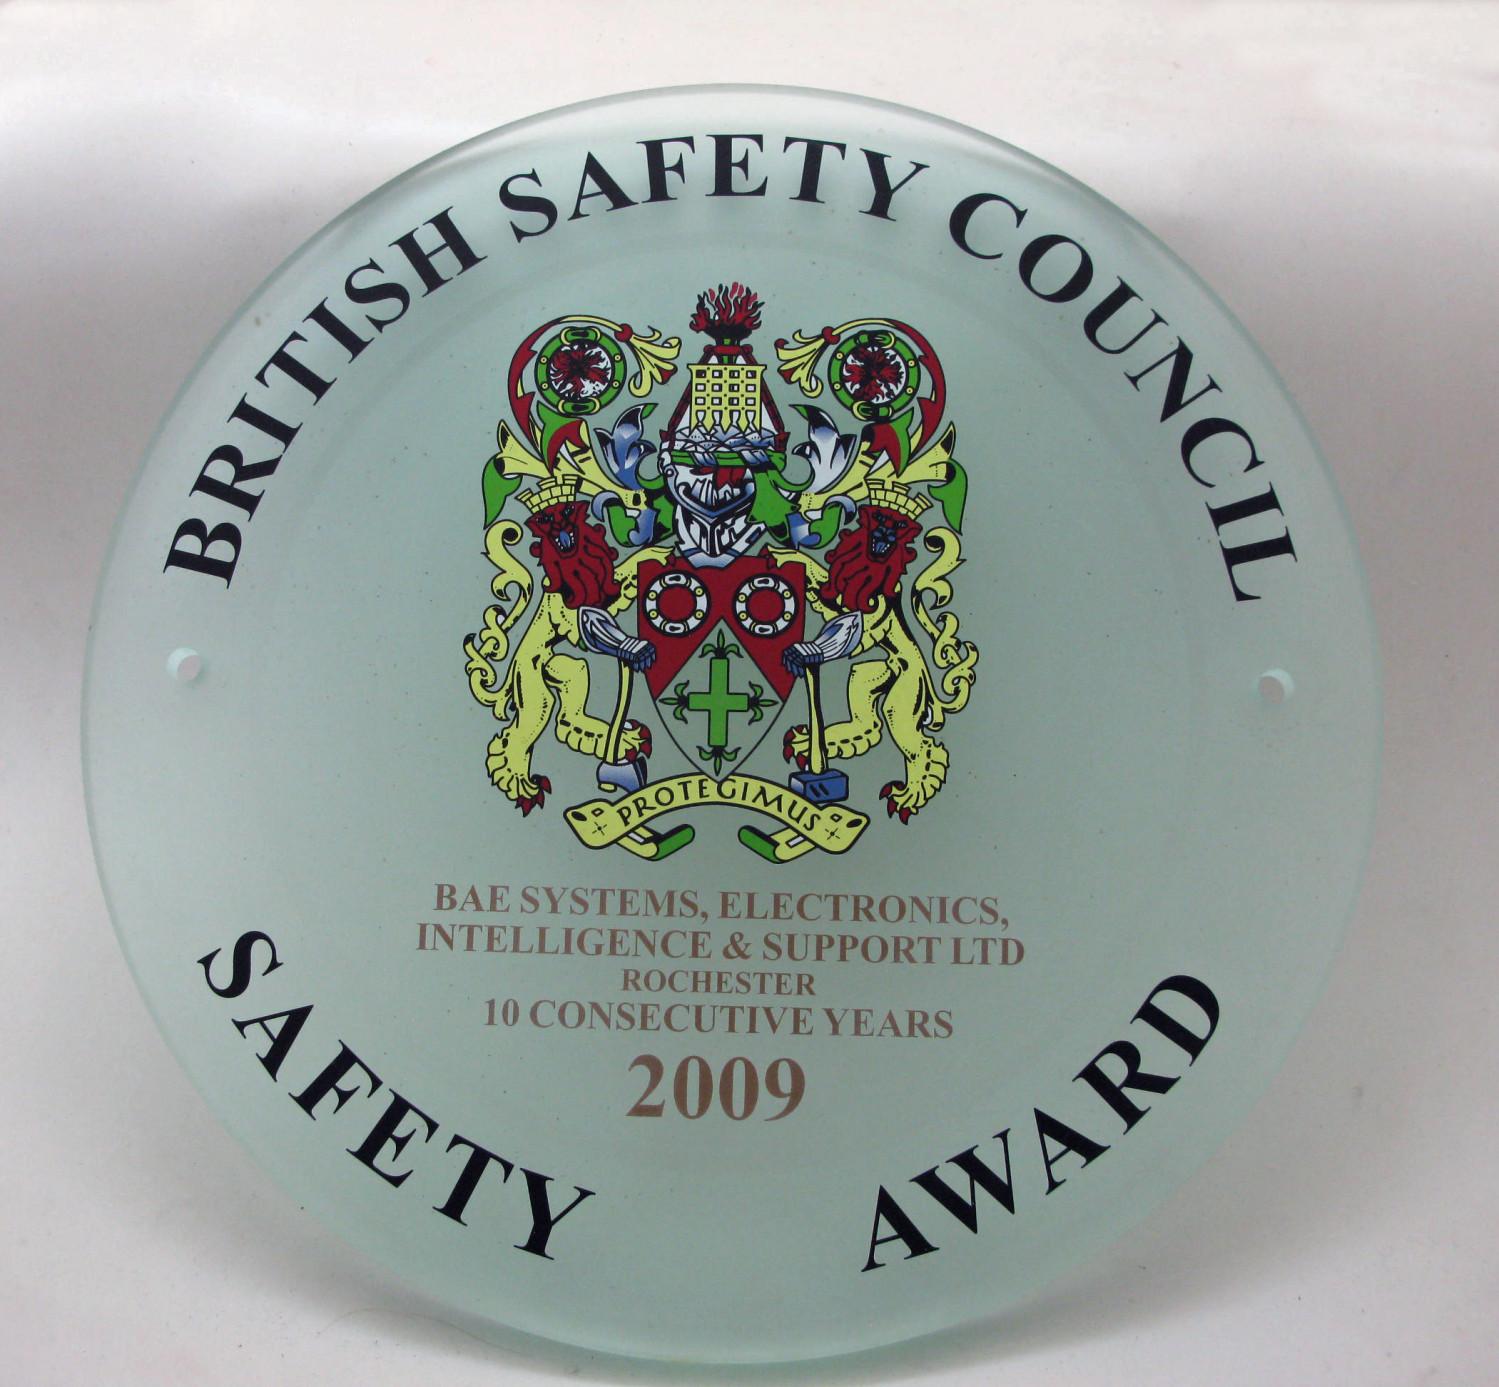 2009 Safety Award Plaque